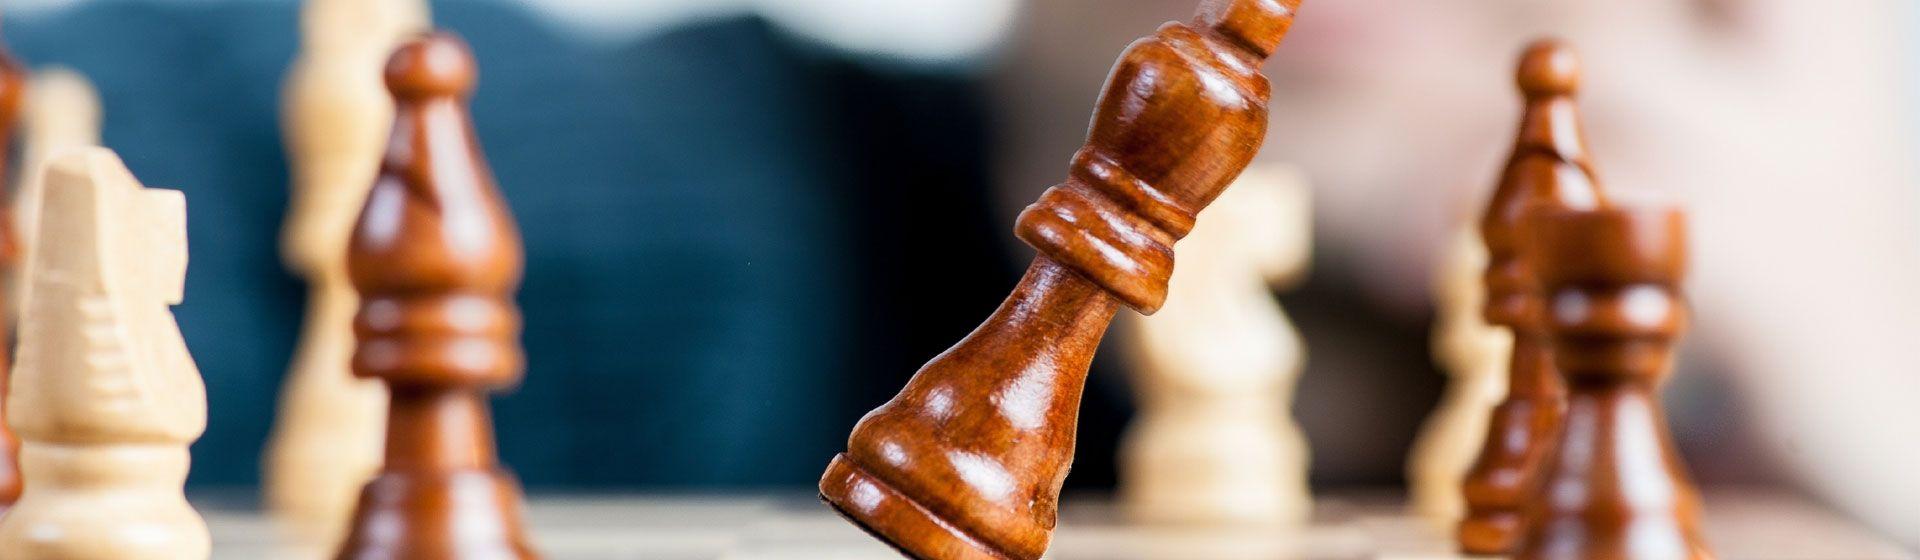 Onde jogar xadrez online?